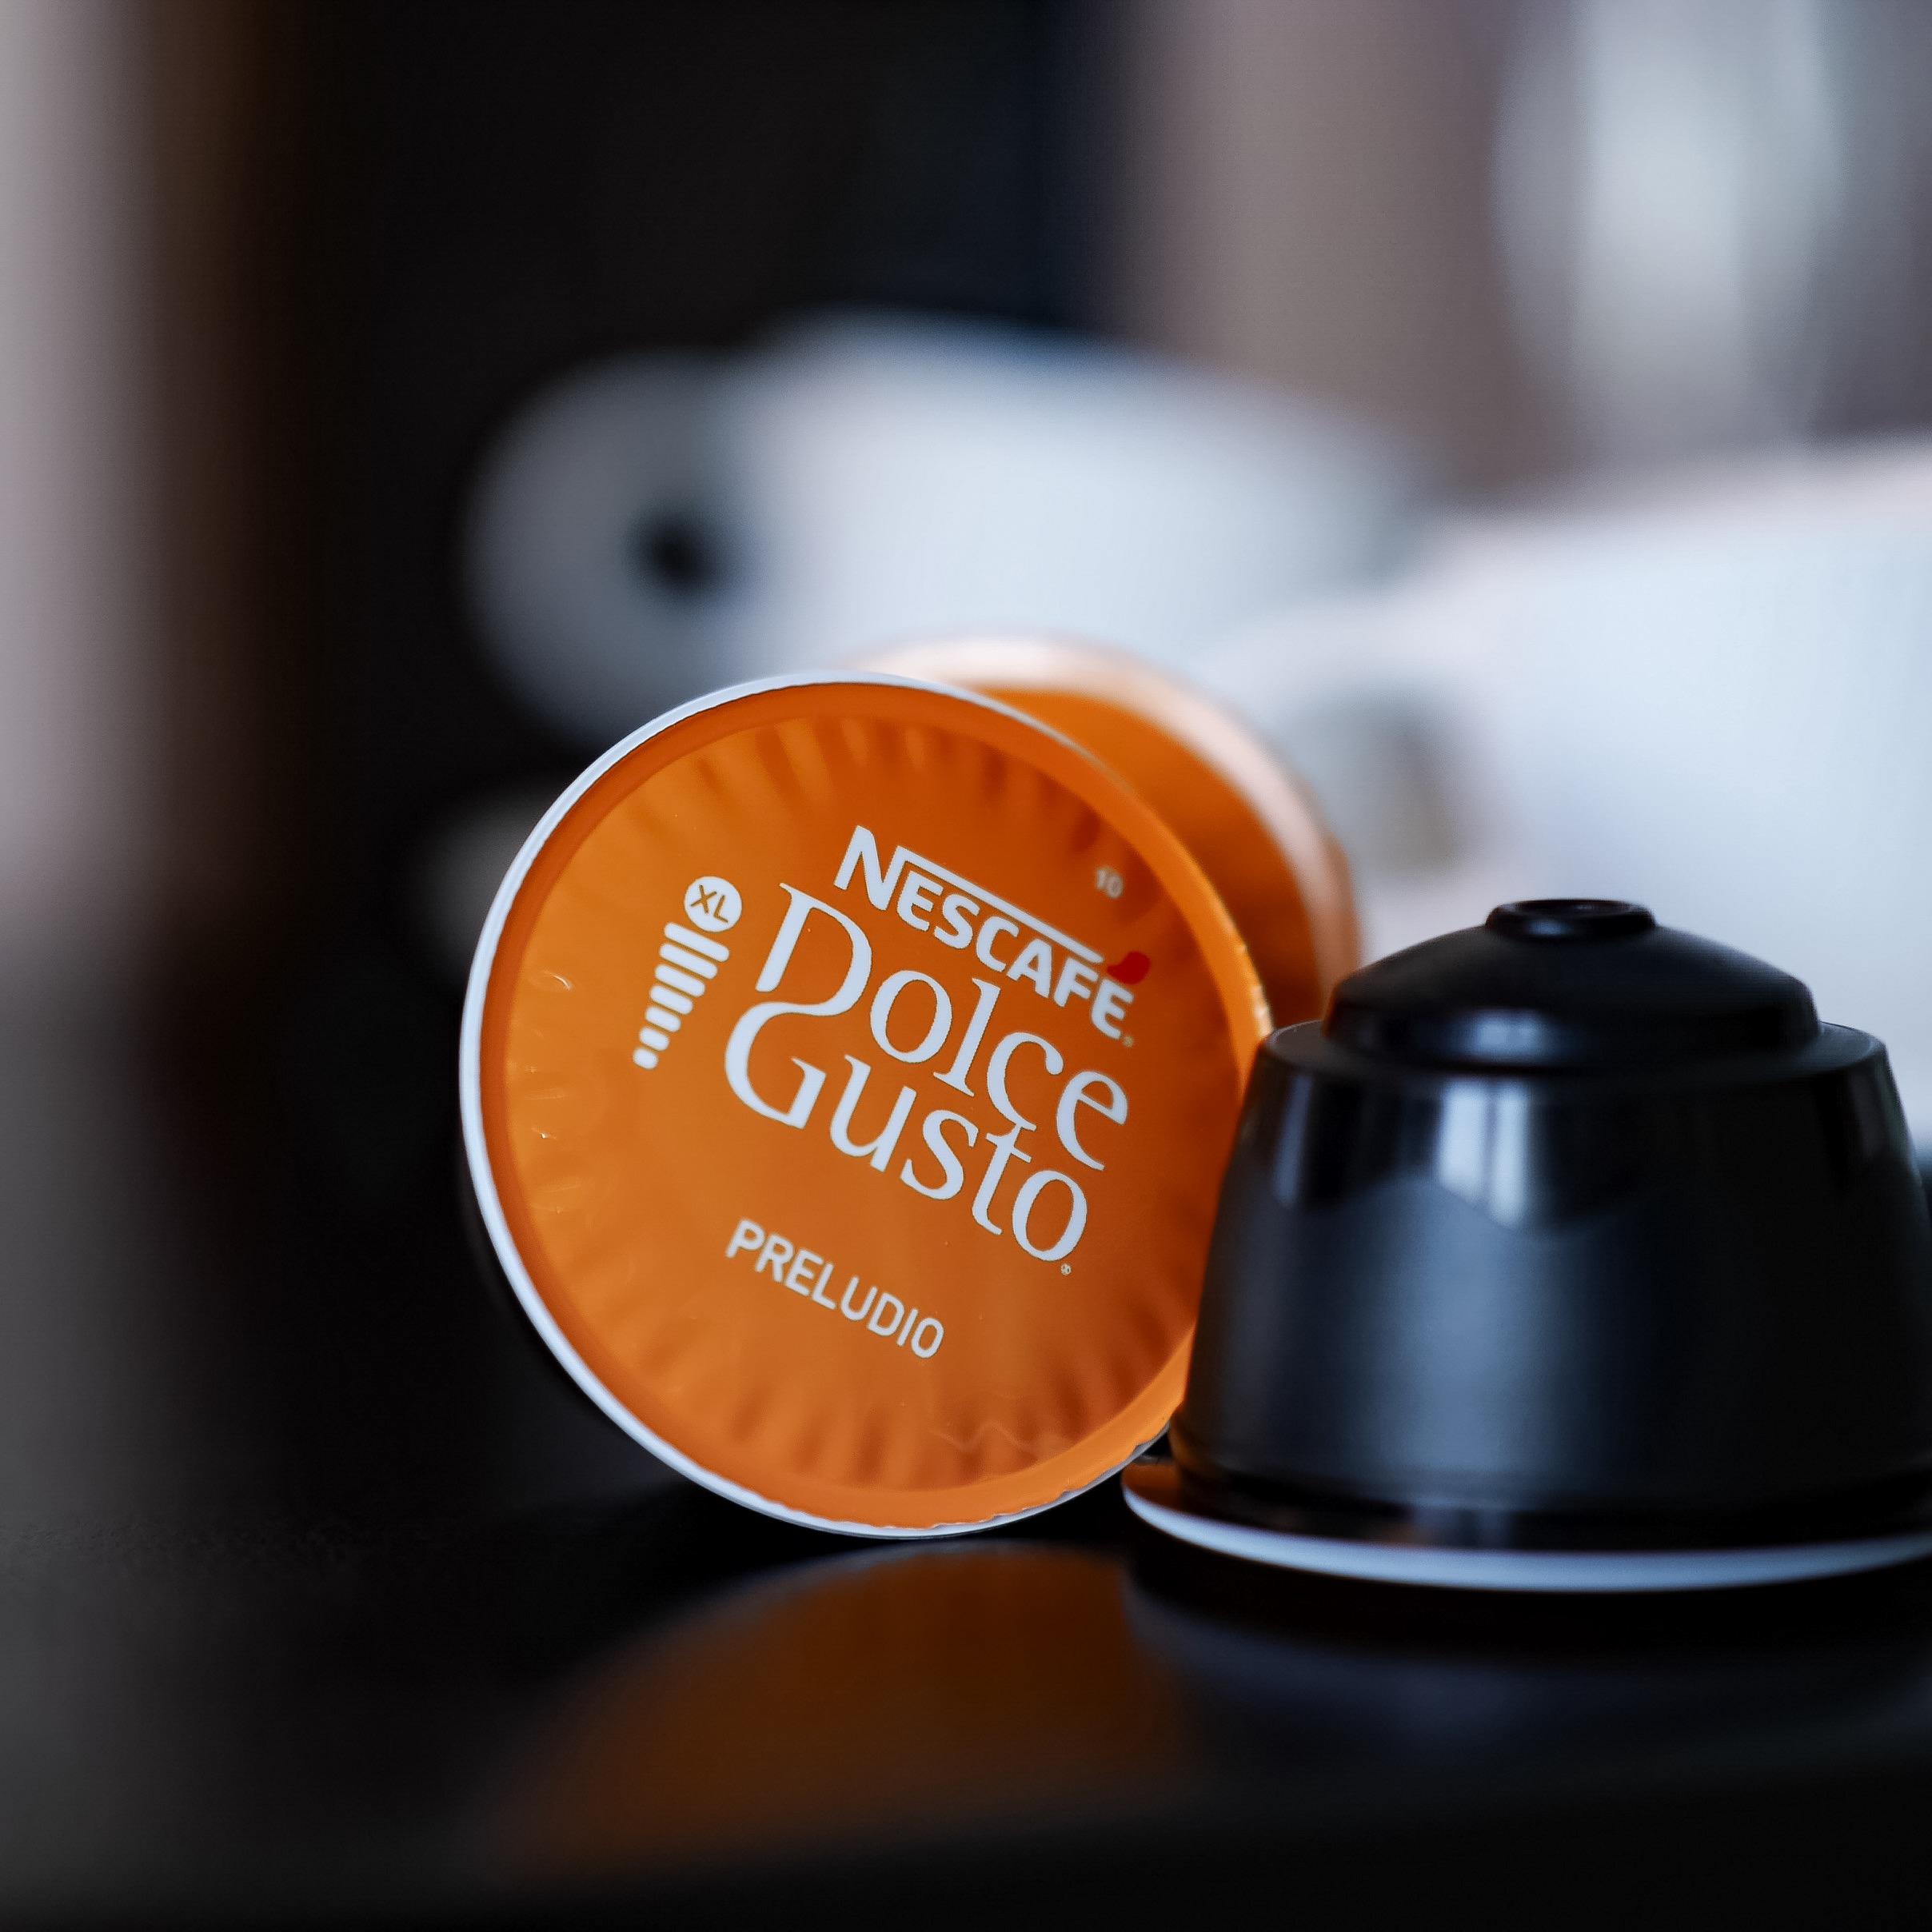 nescafé dolce gusto café